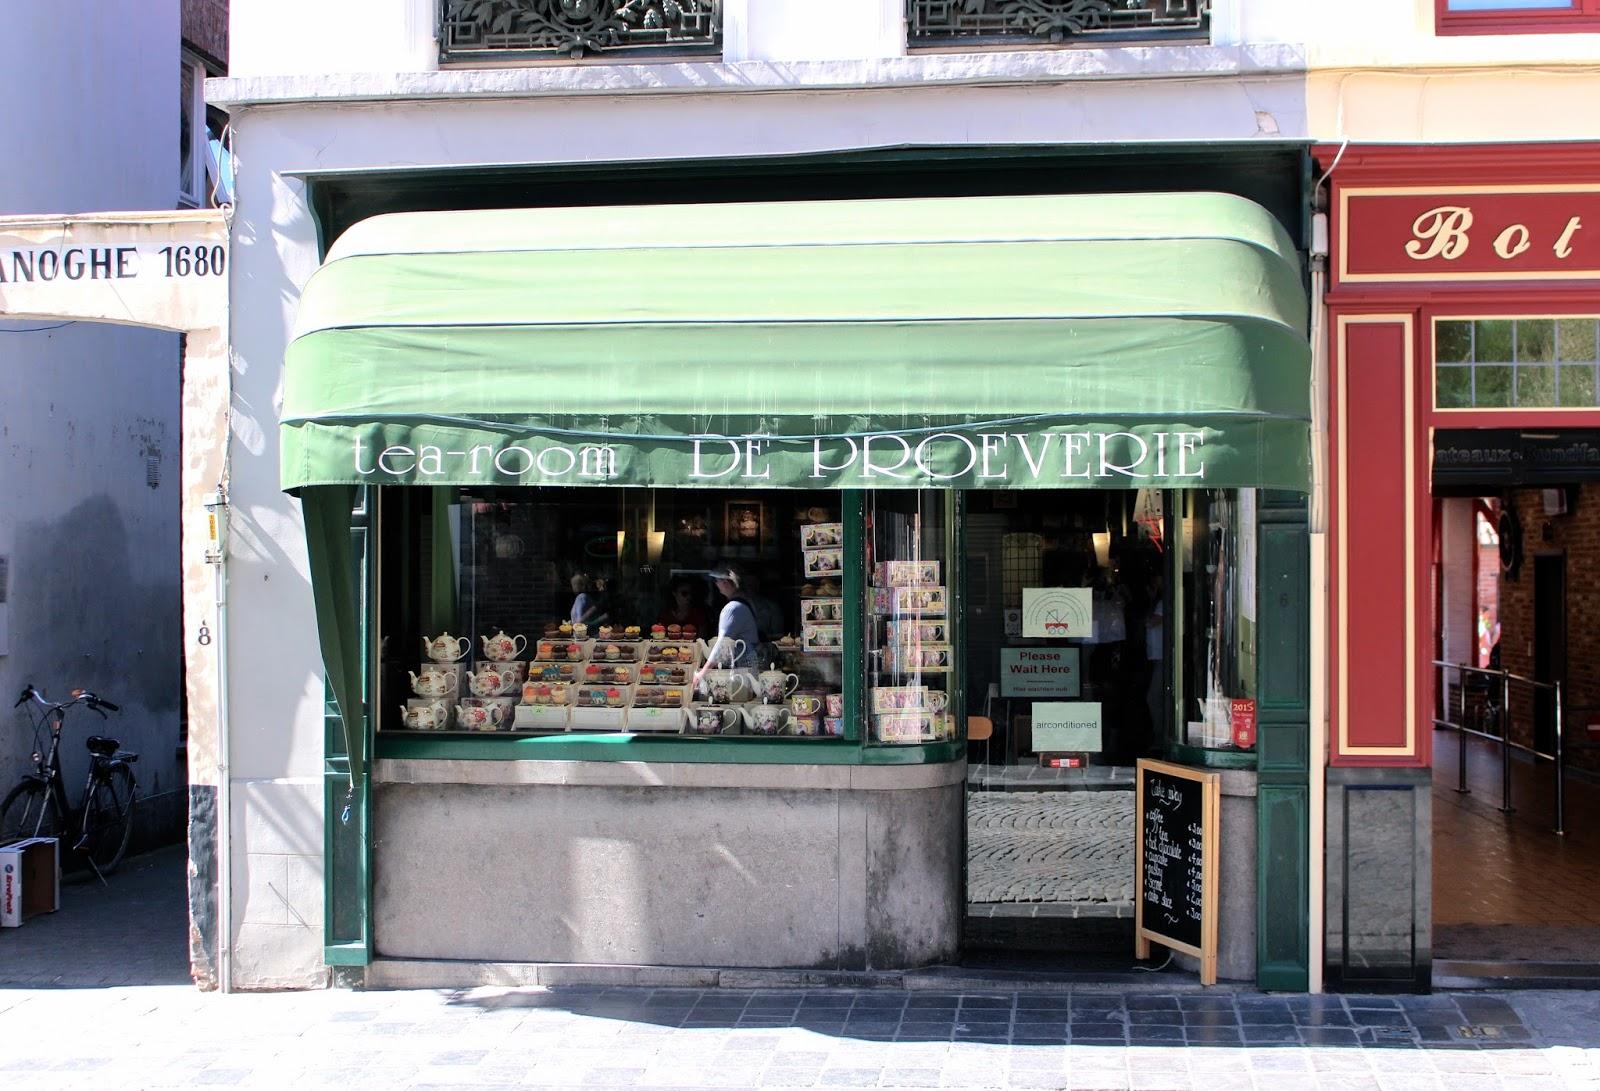 Bruges Tea-room De Proeverie travel blog review